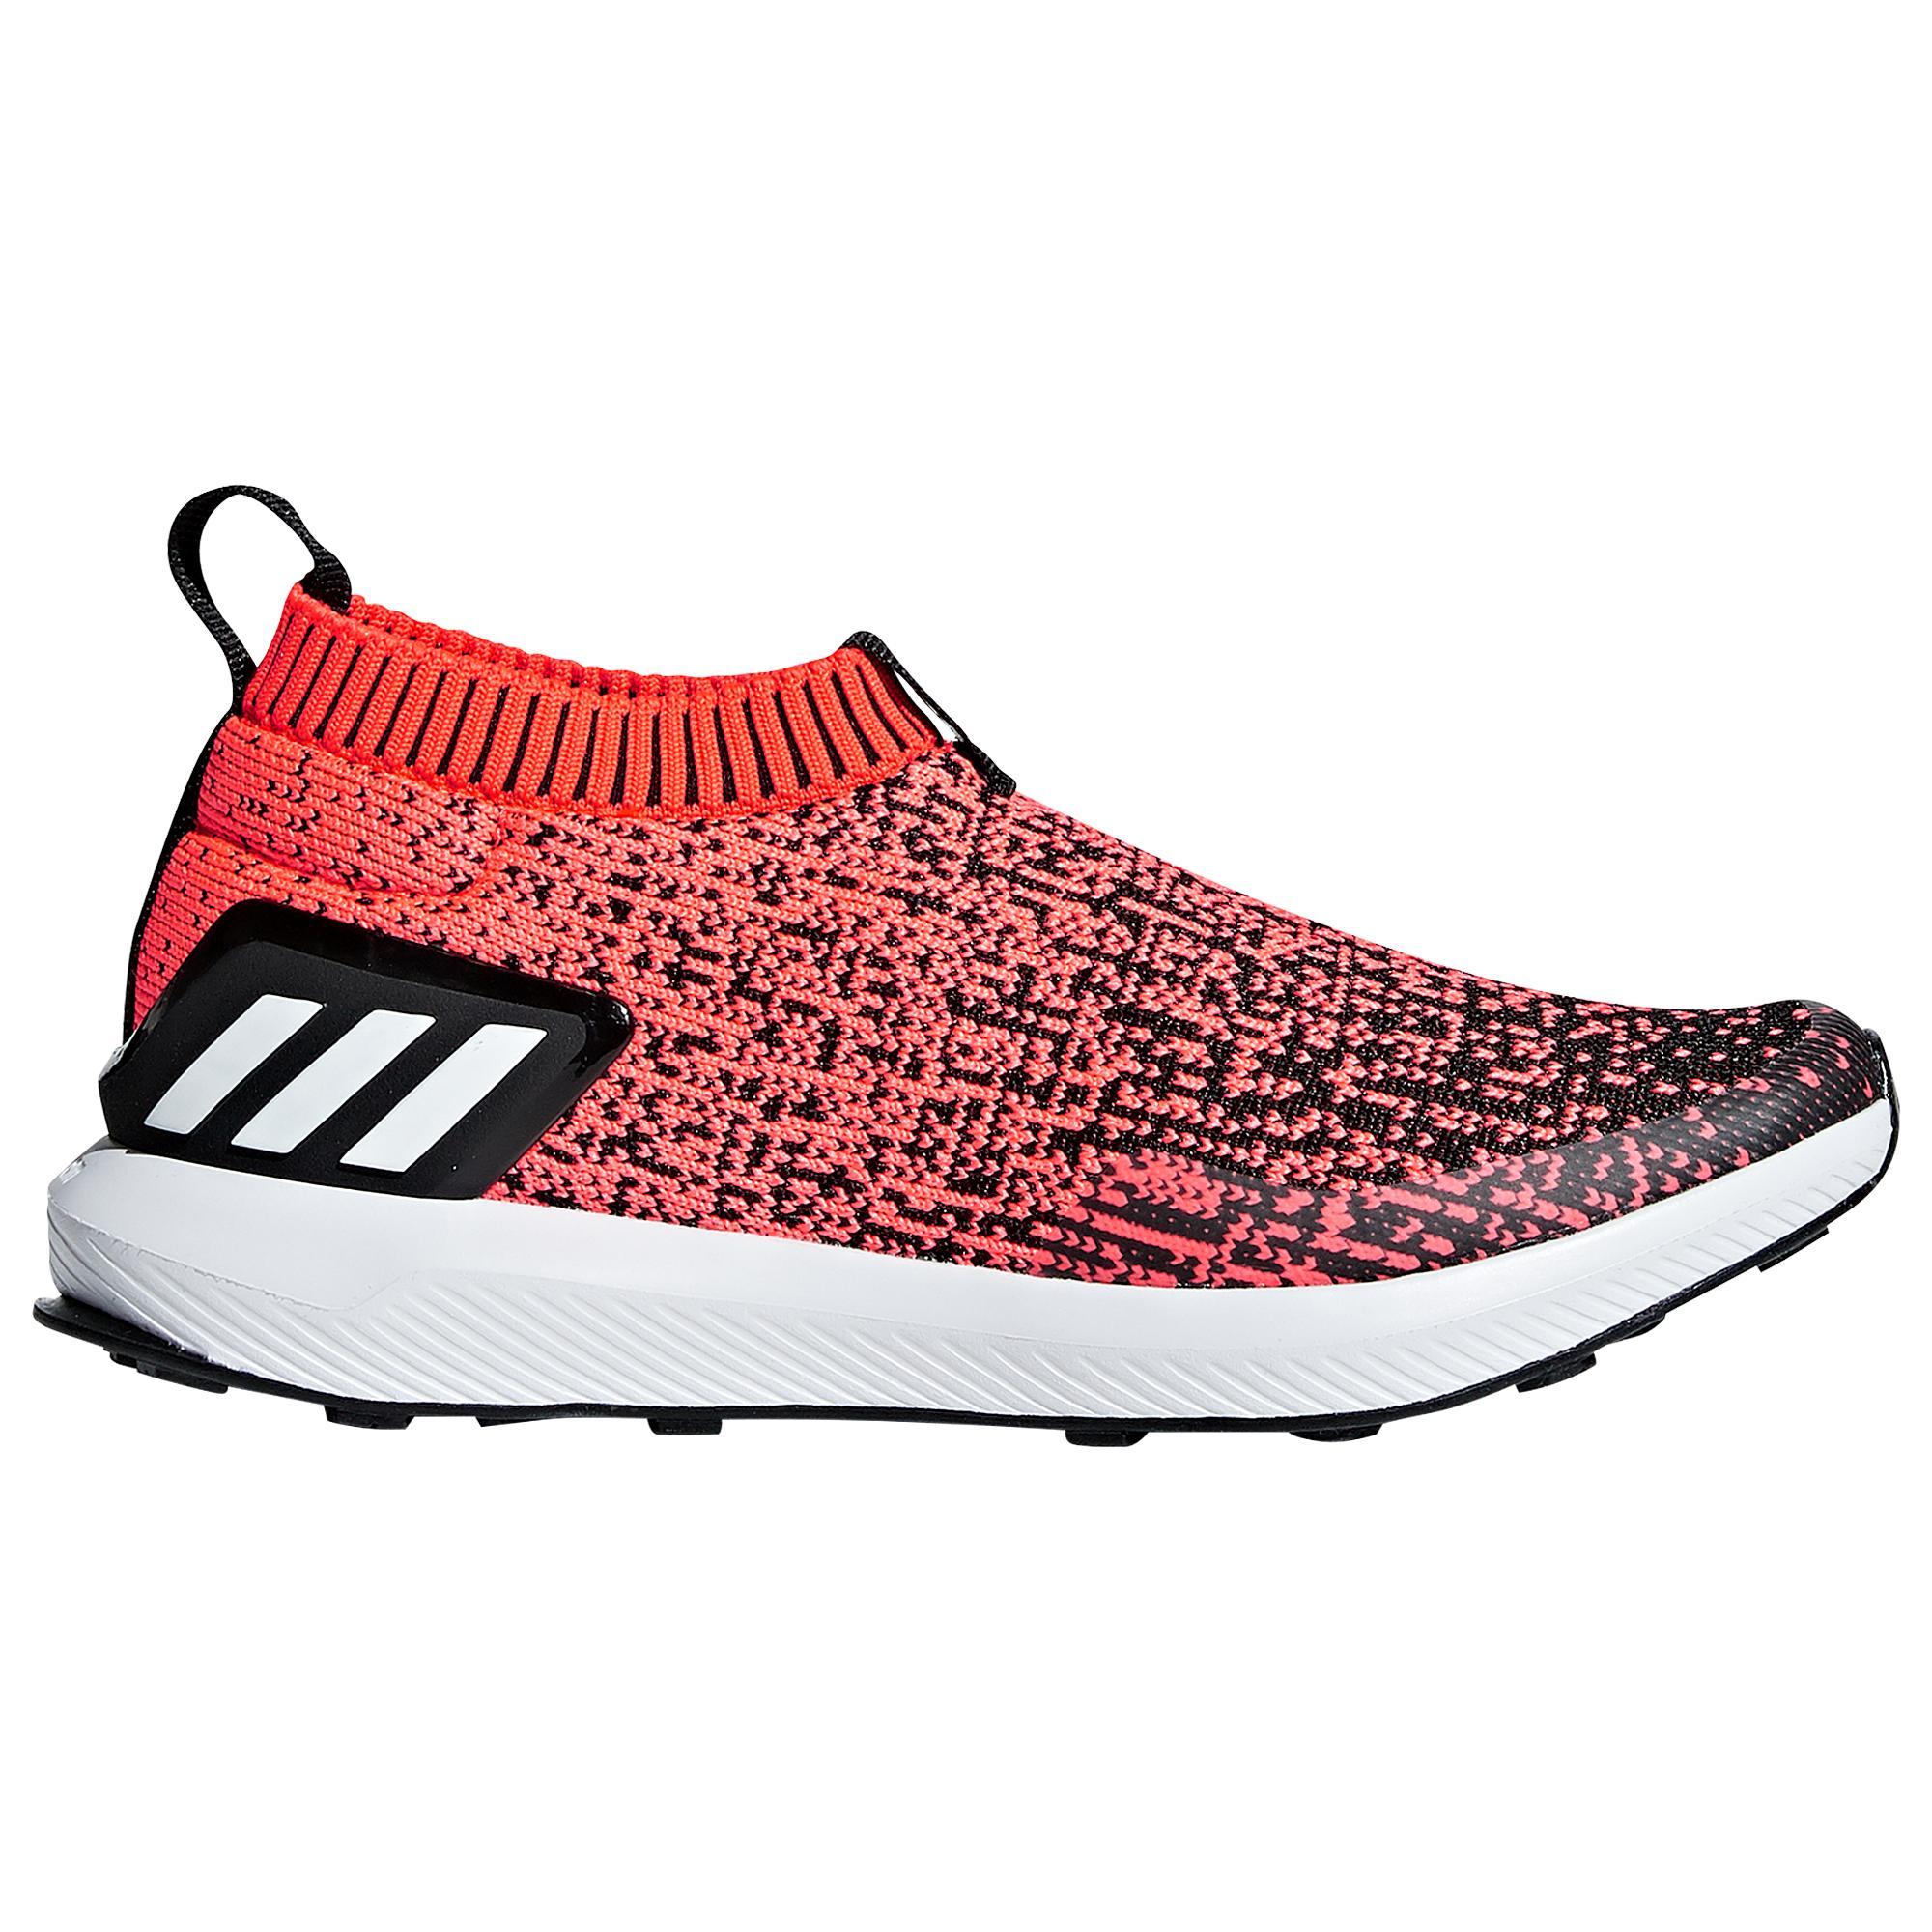 Rapidarun Laceless Running Shoes